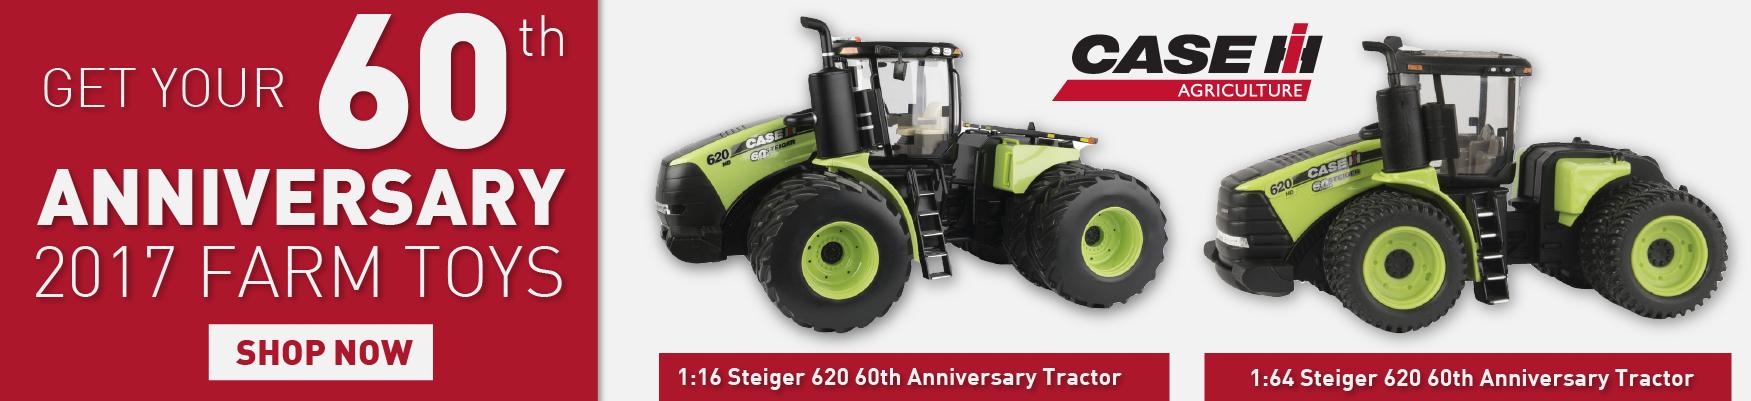 60th Anniversary 2017 Farm Toys